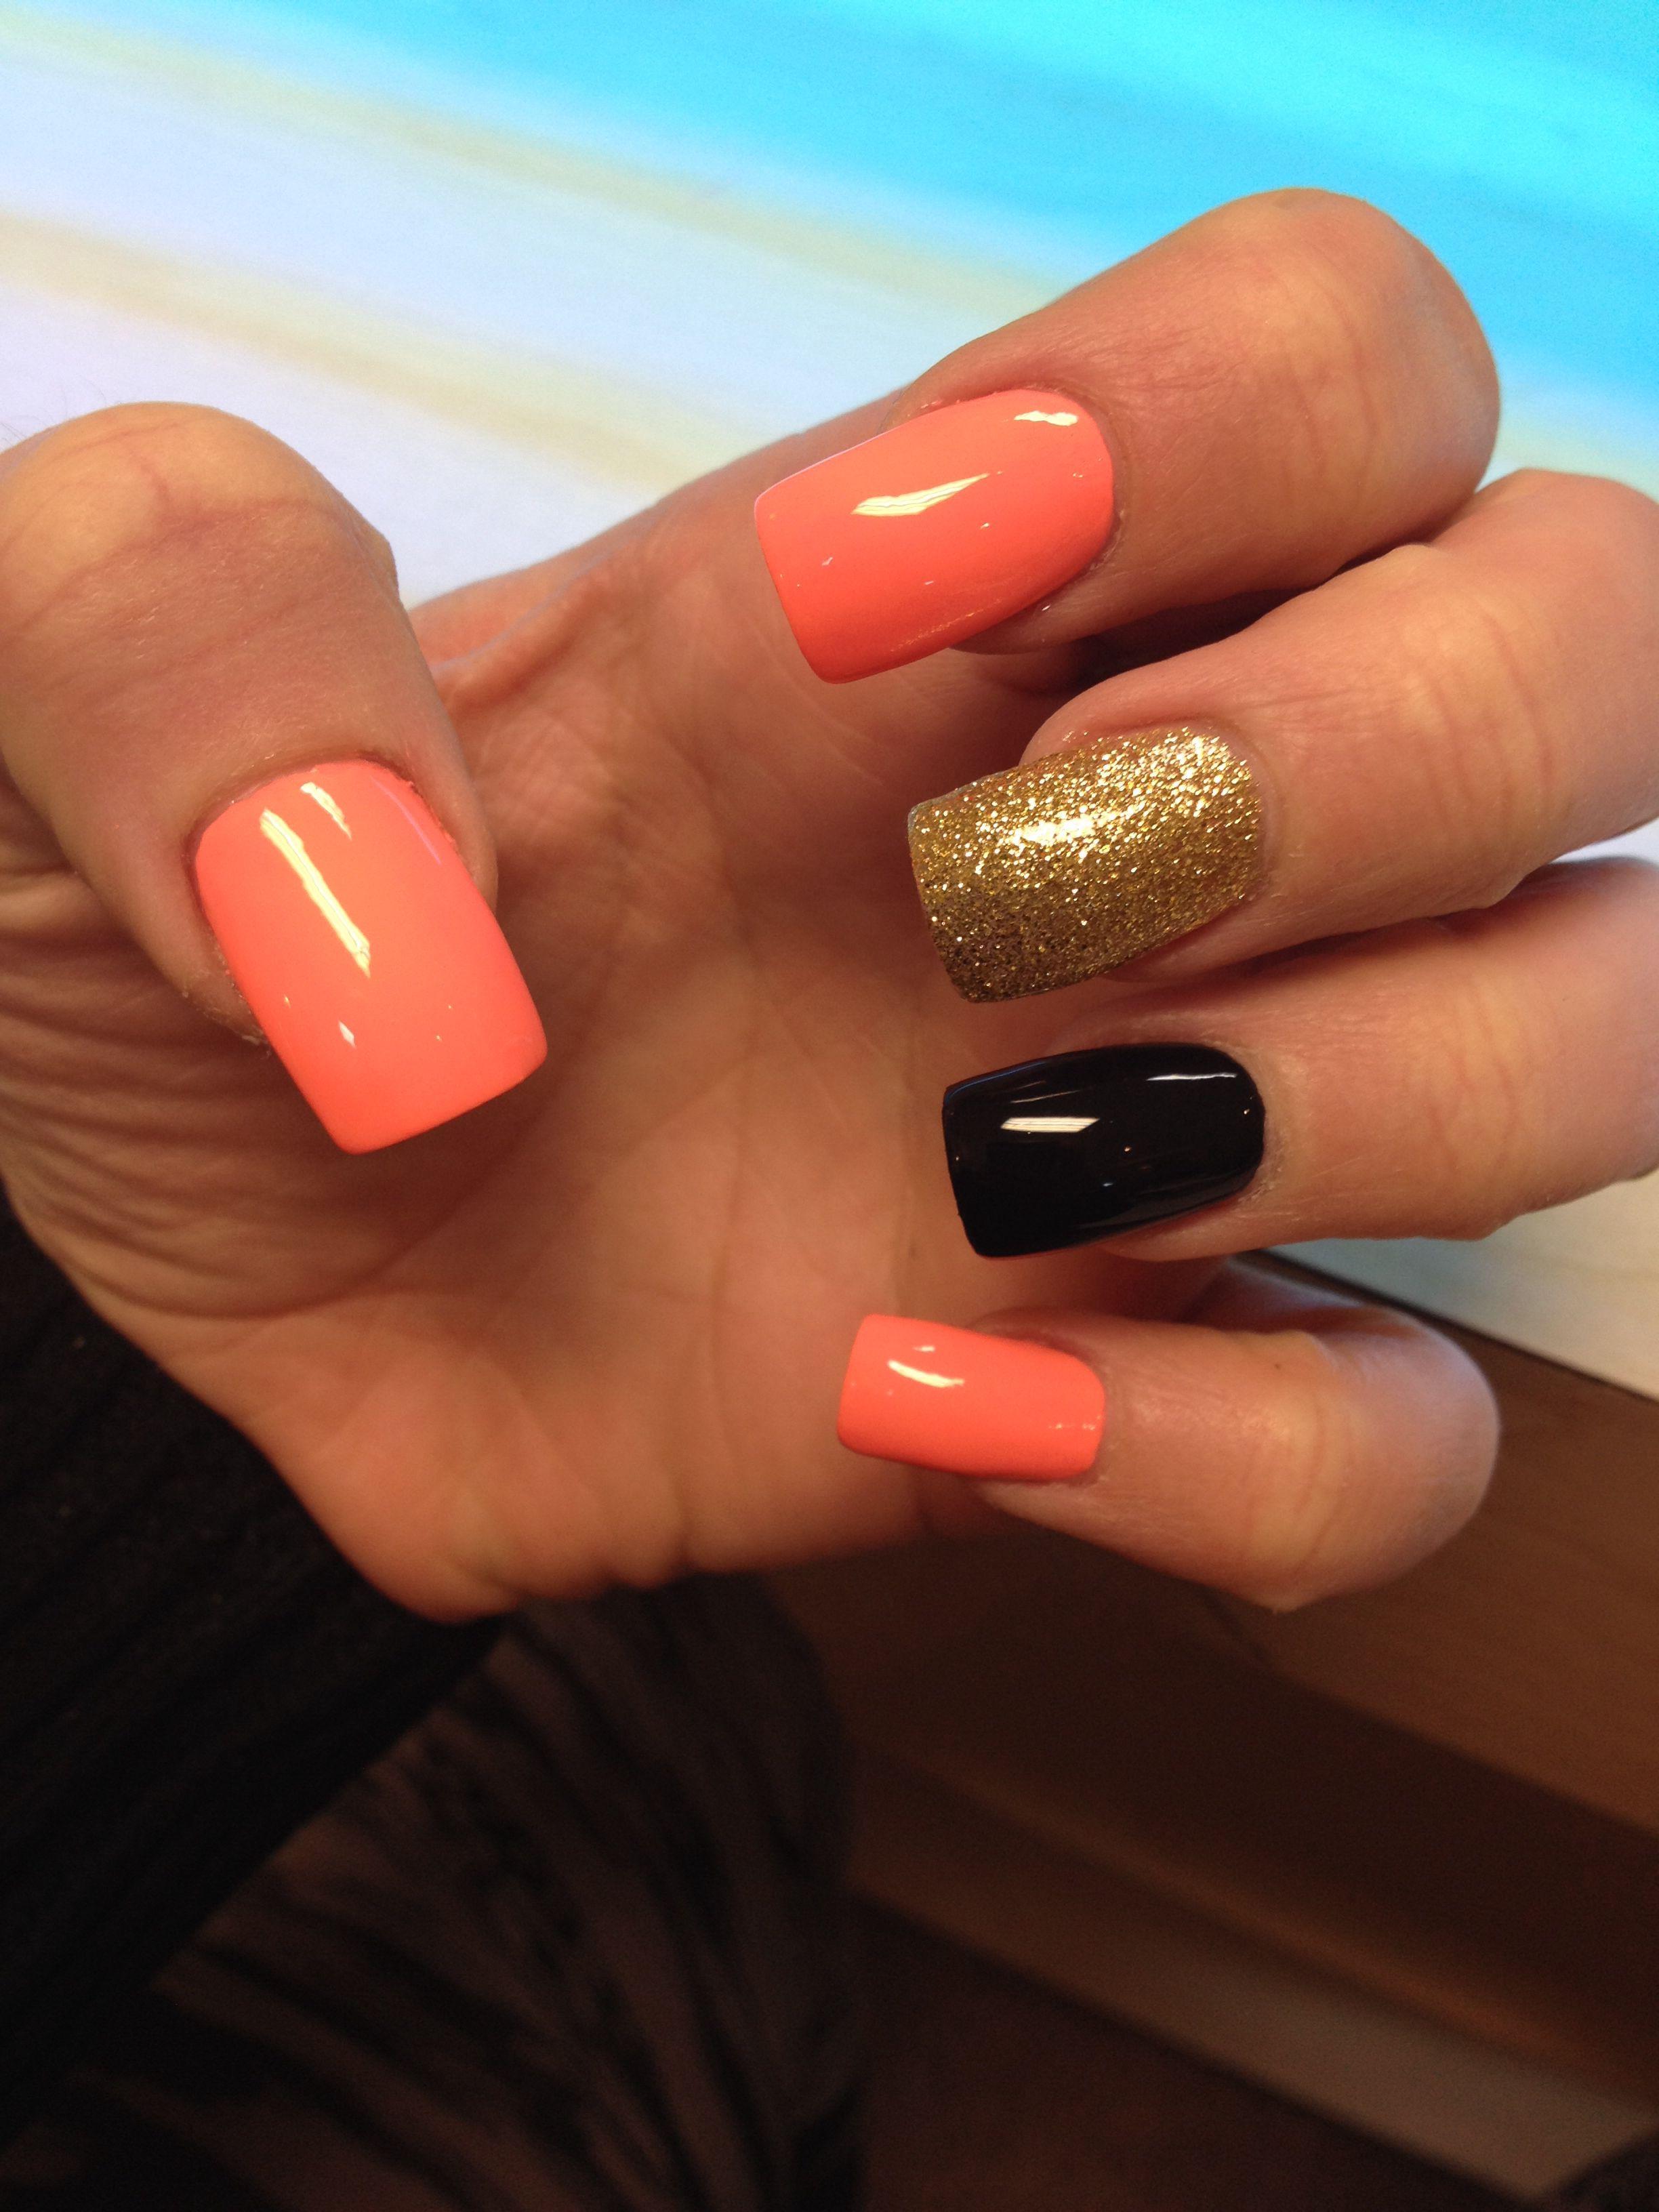 Nails Black Coral Gold Glitter Black Nails With Glitter Holiday Nails Glitter Nails